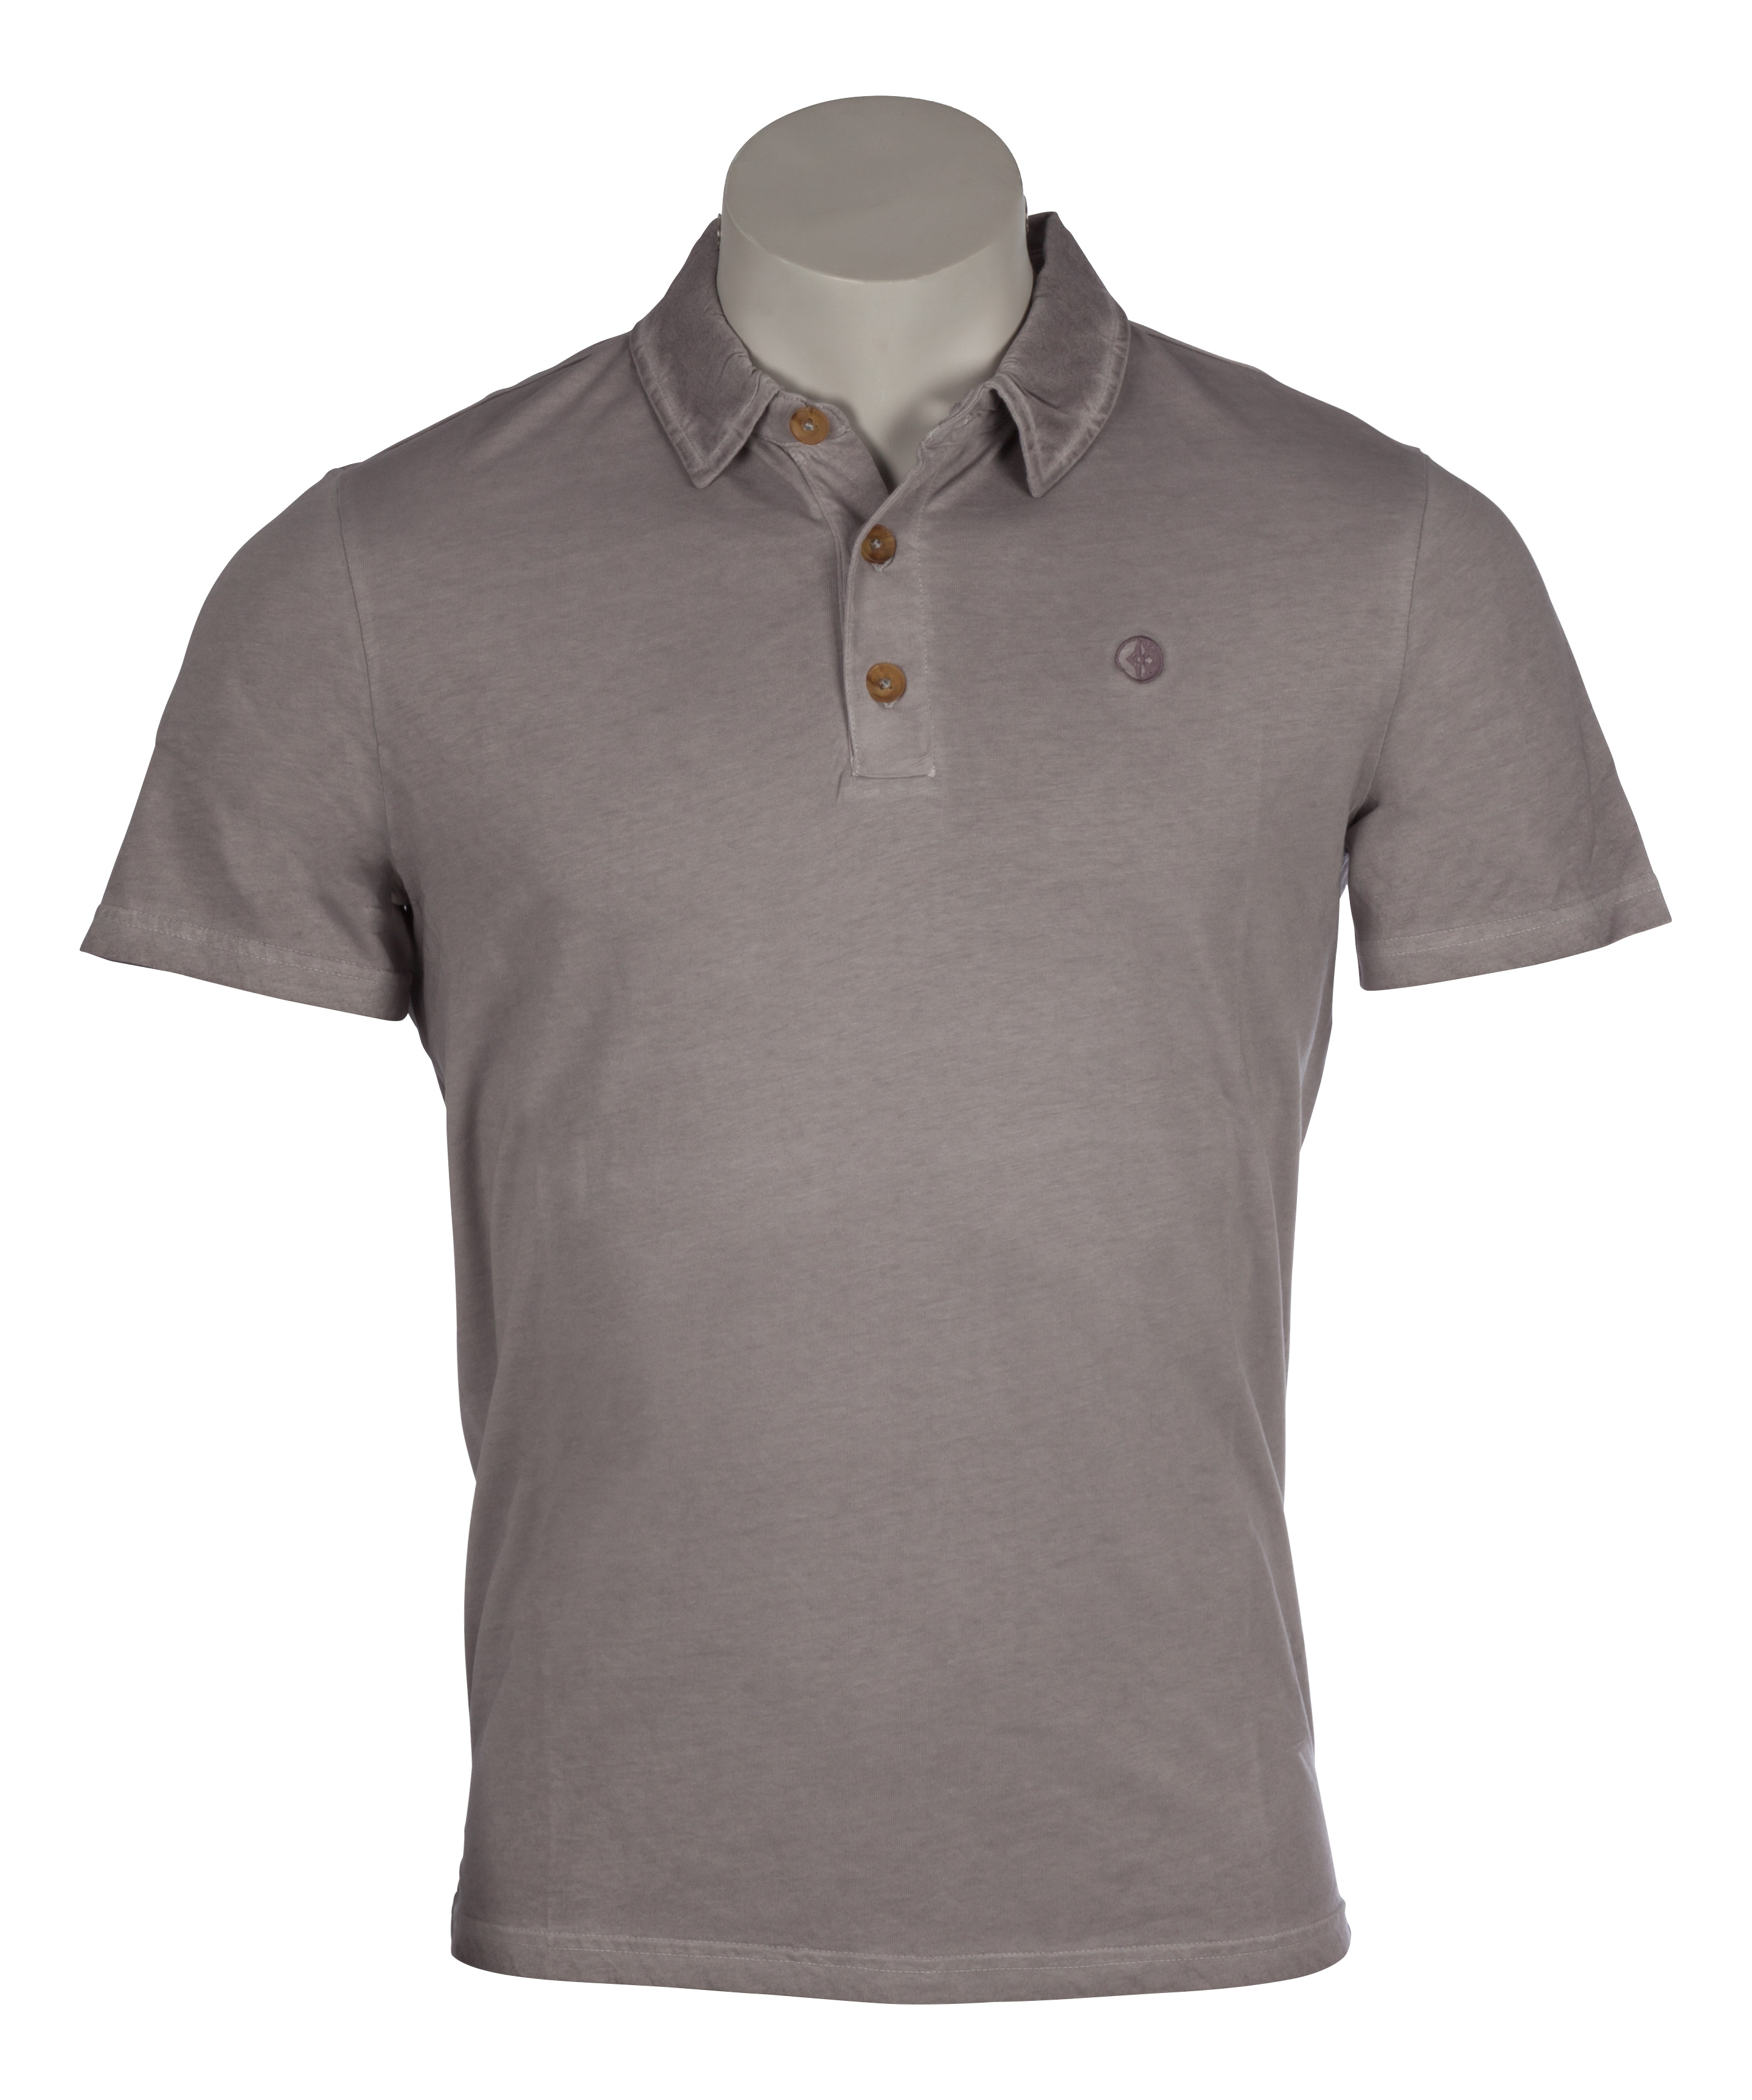 arqueonautas herren poloshirt polo shirt t shirt s m l xl xxl xxxl 2xl. Black Bedroom Furniture Sets. Home Design Ideas